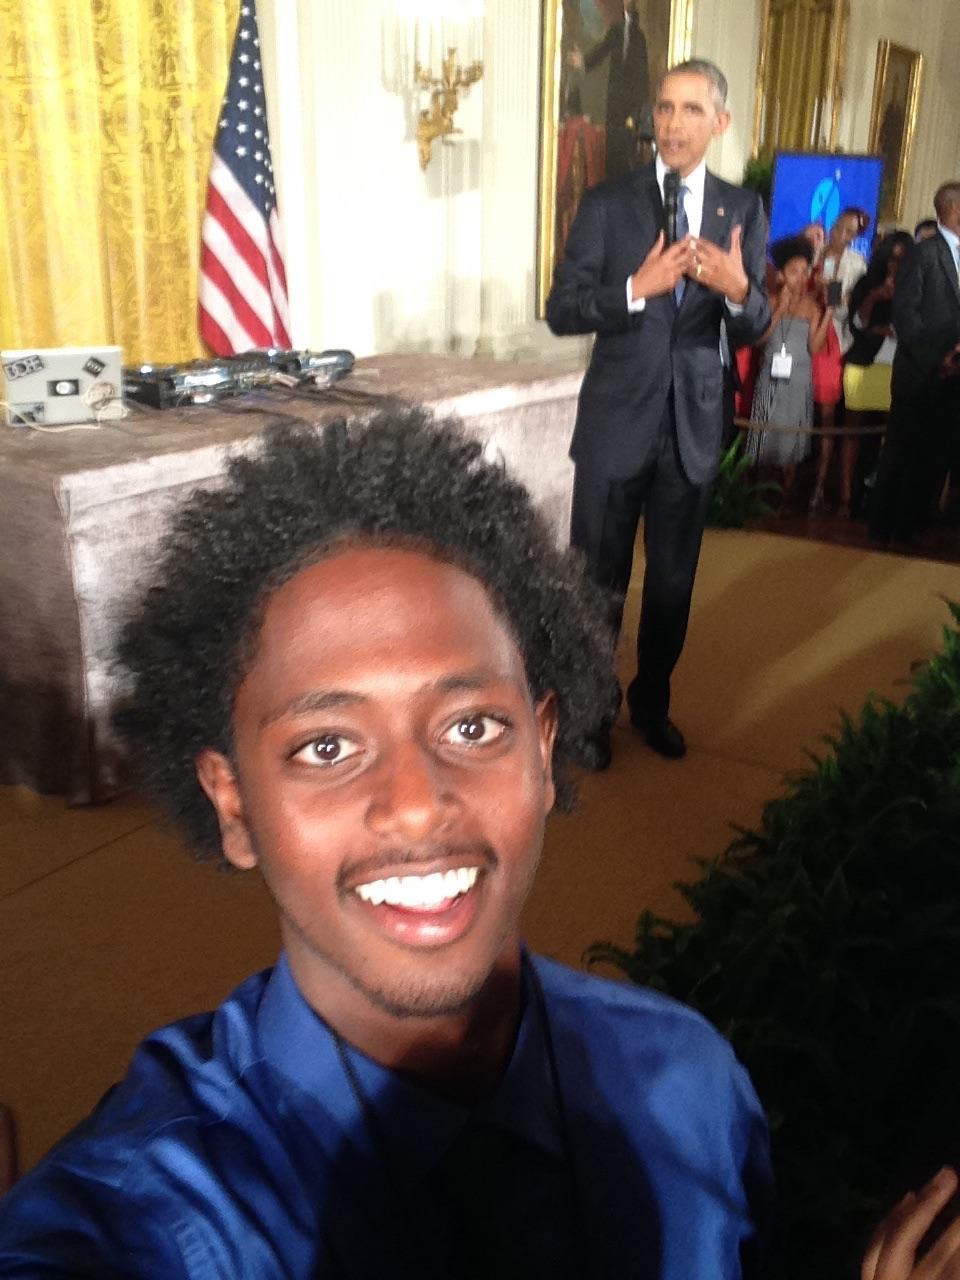 Dawit_and_Obama